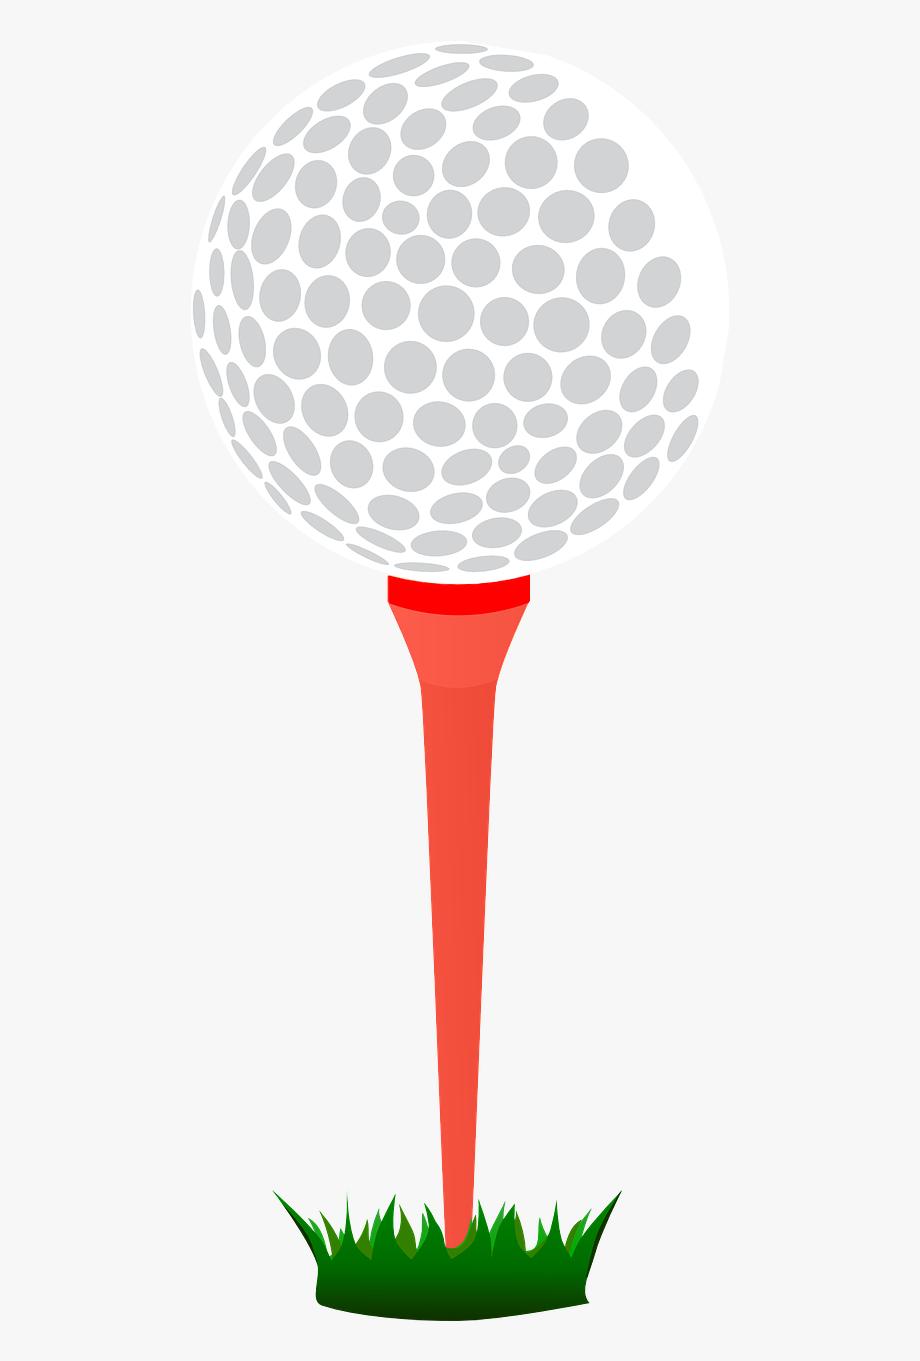 Clip Art Golf Tee , Transparent Cartoon, Free Cliparts.